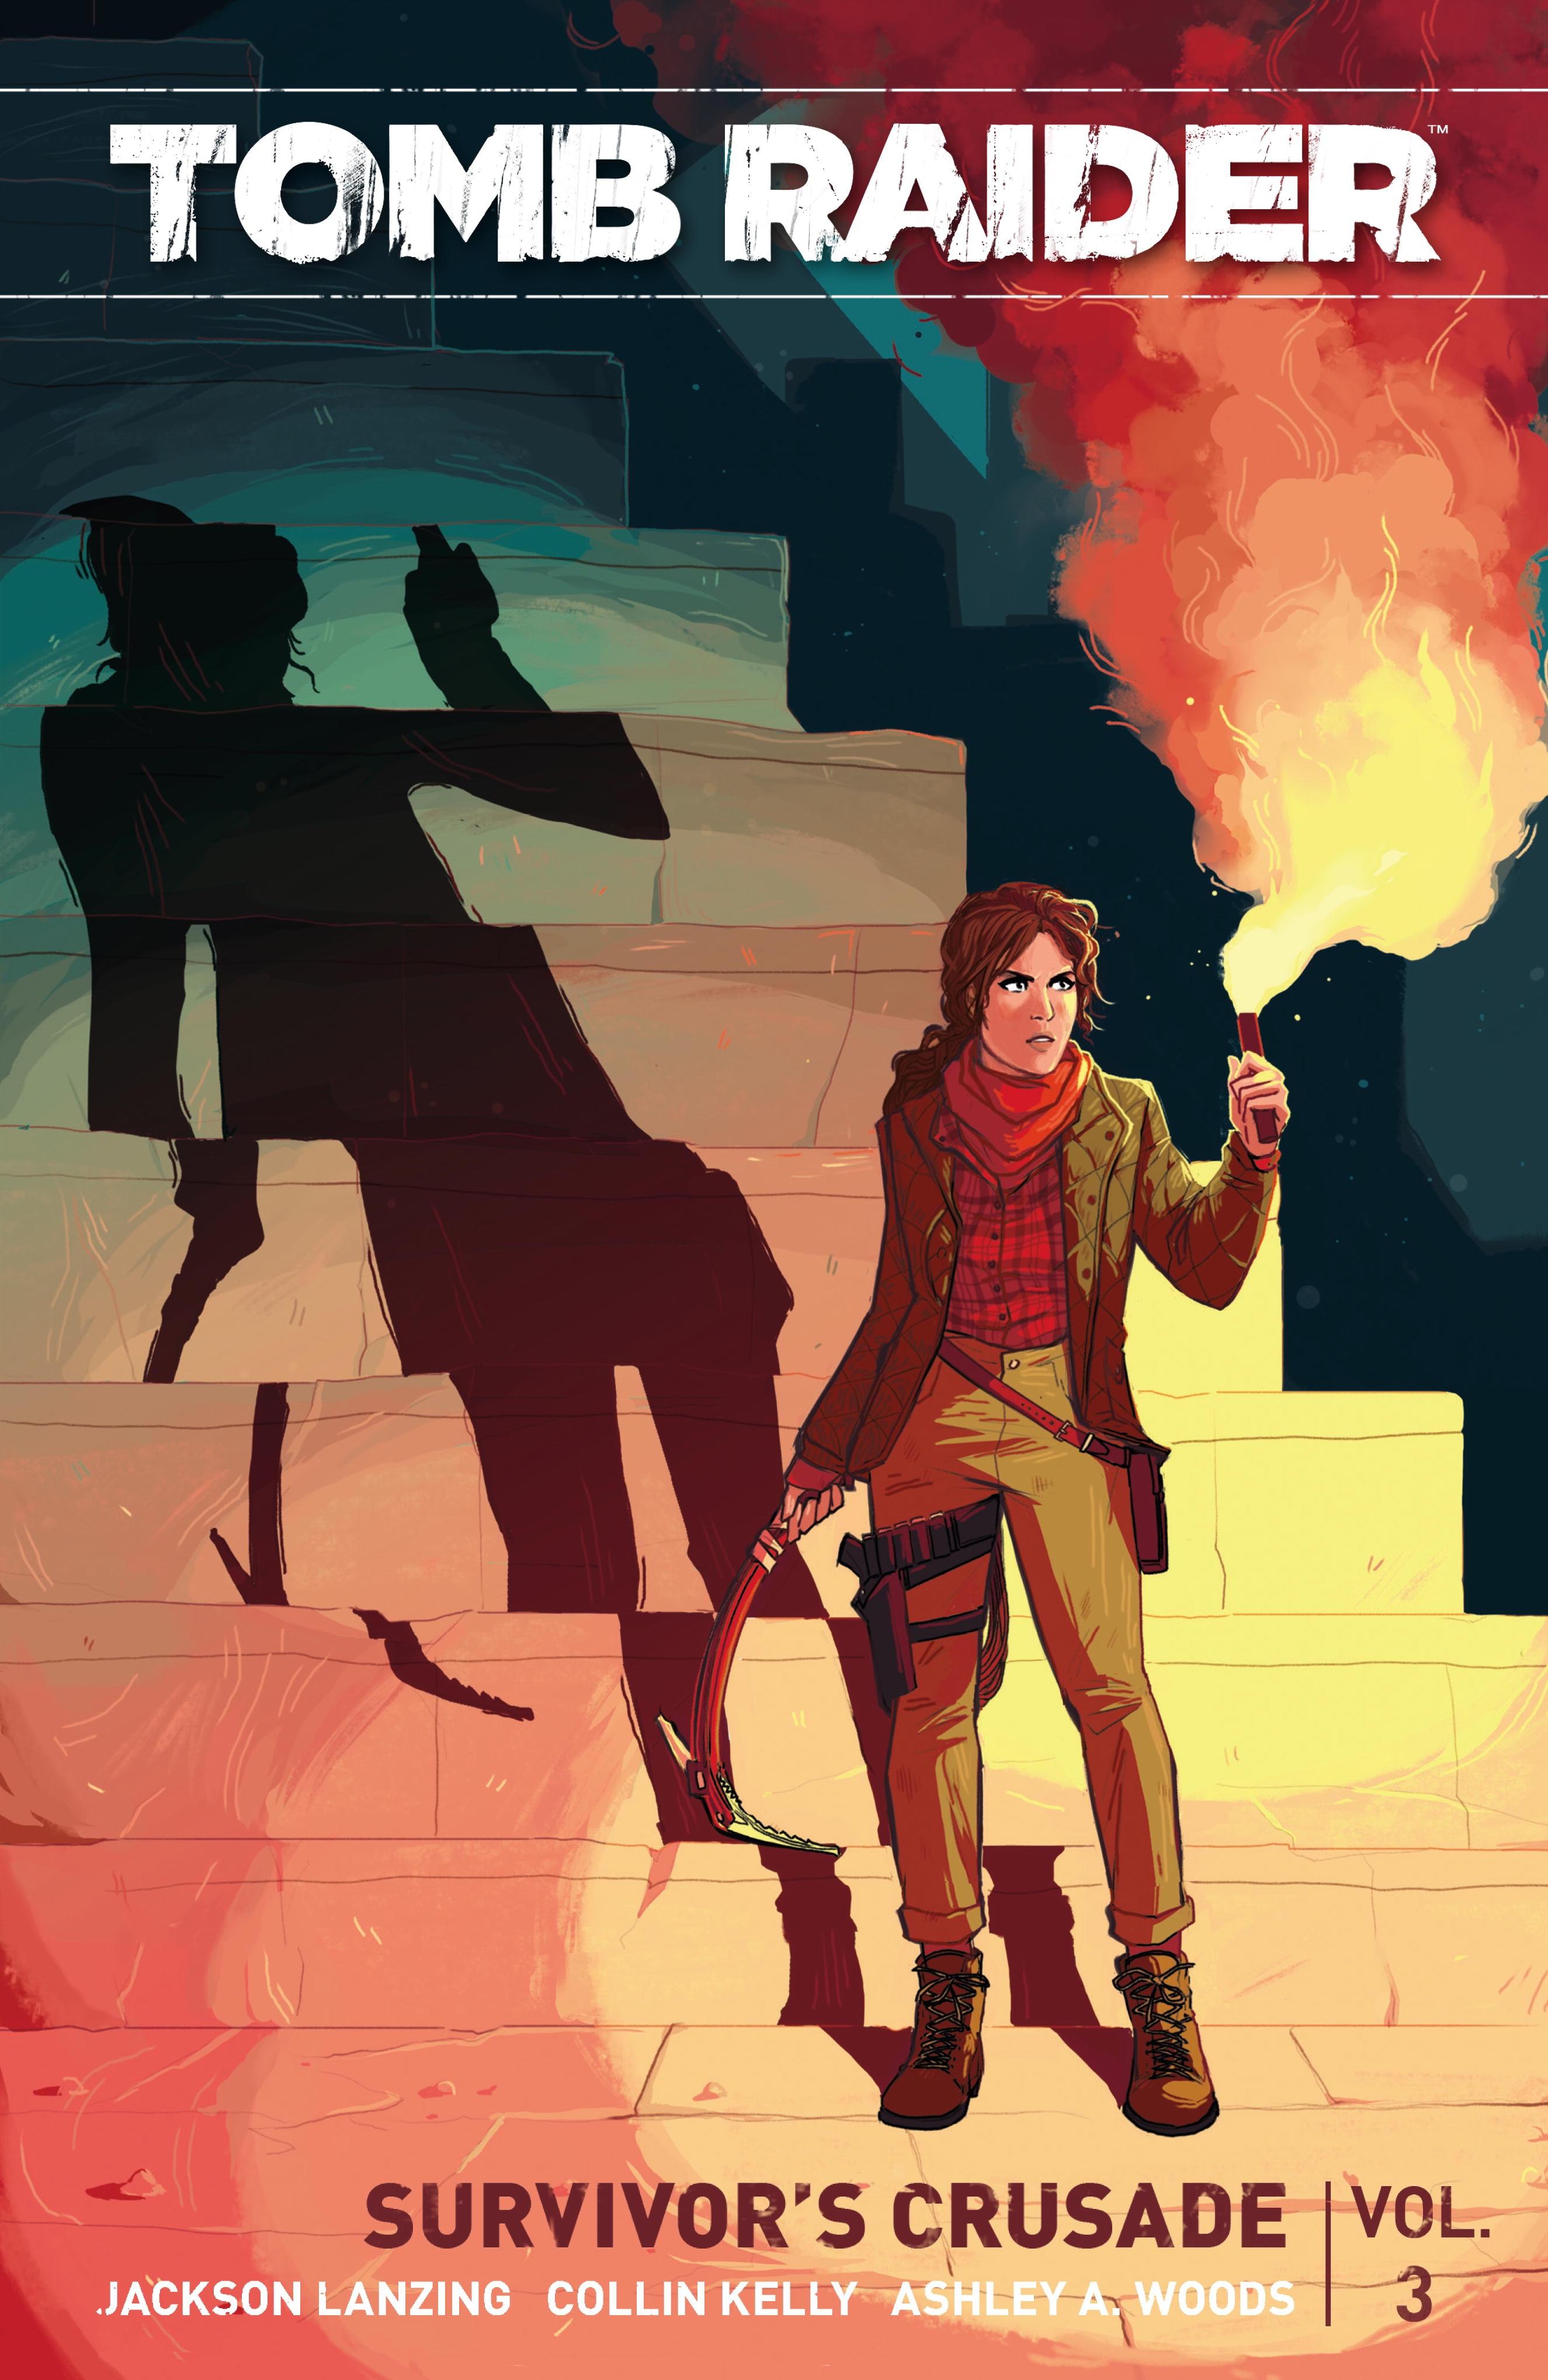 Tomb Raider Volume 3 Crusade